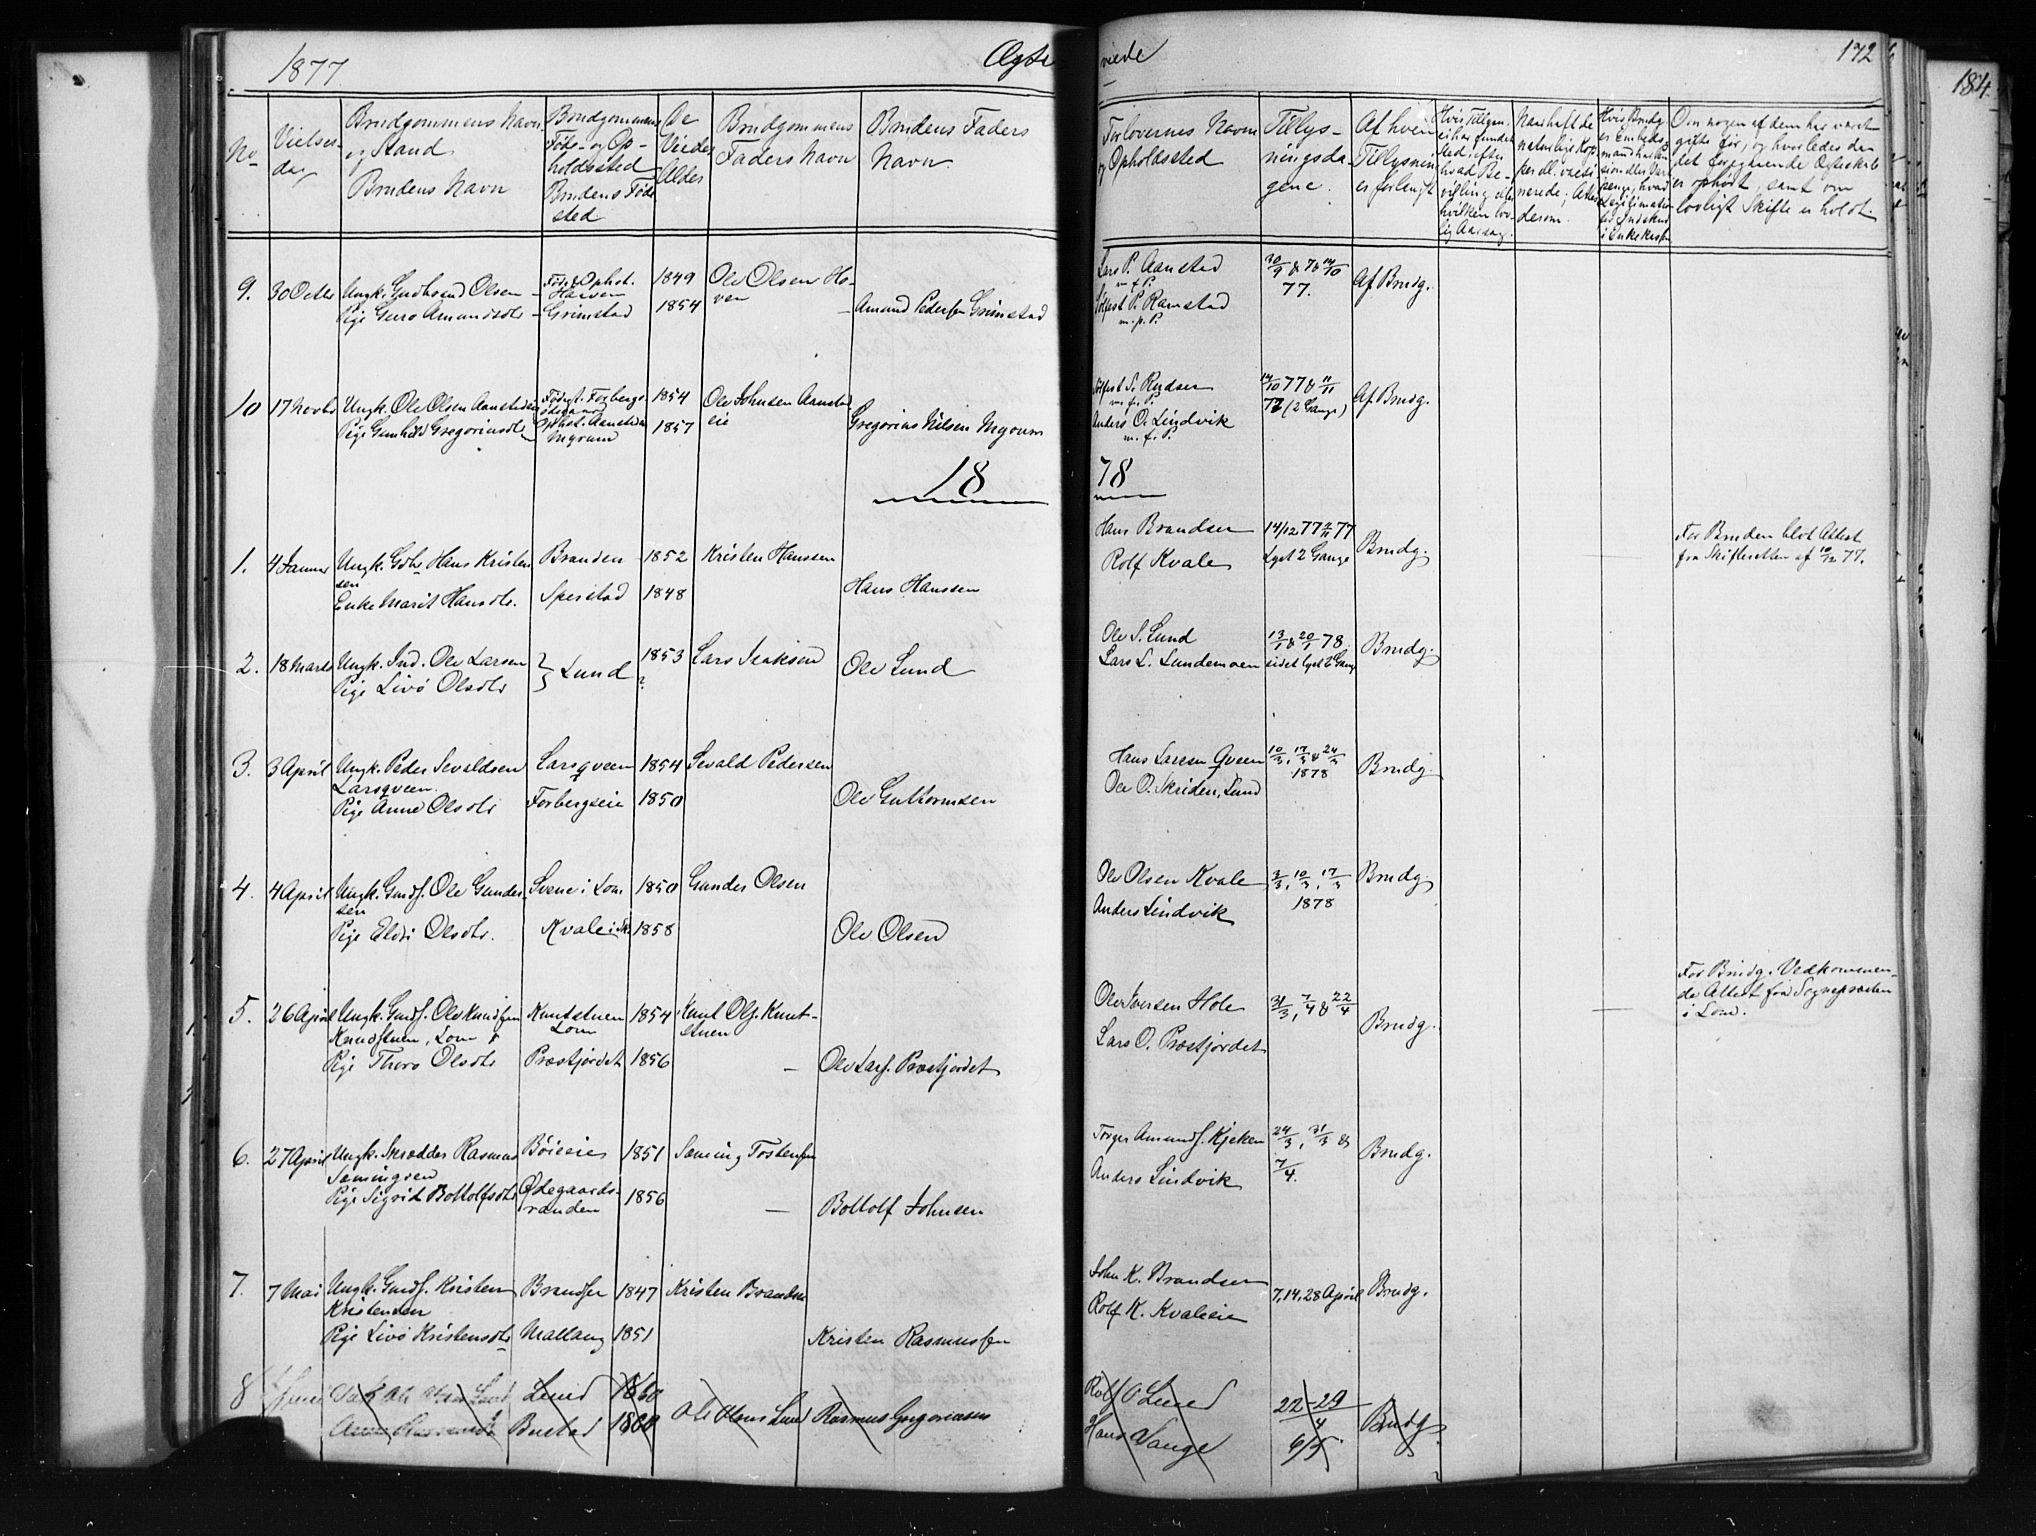 SAH, Skjåk prestekontor, Klokkerbok nr. 1, 1865-1893, s. 172